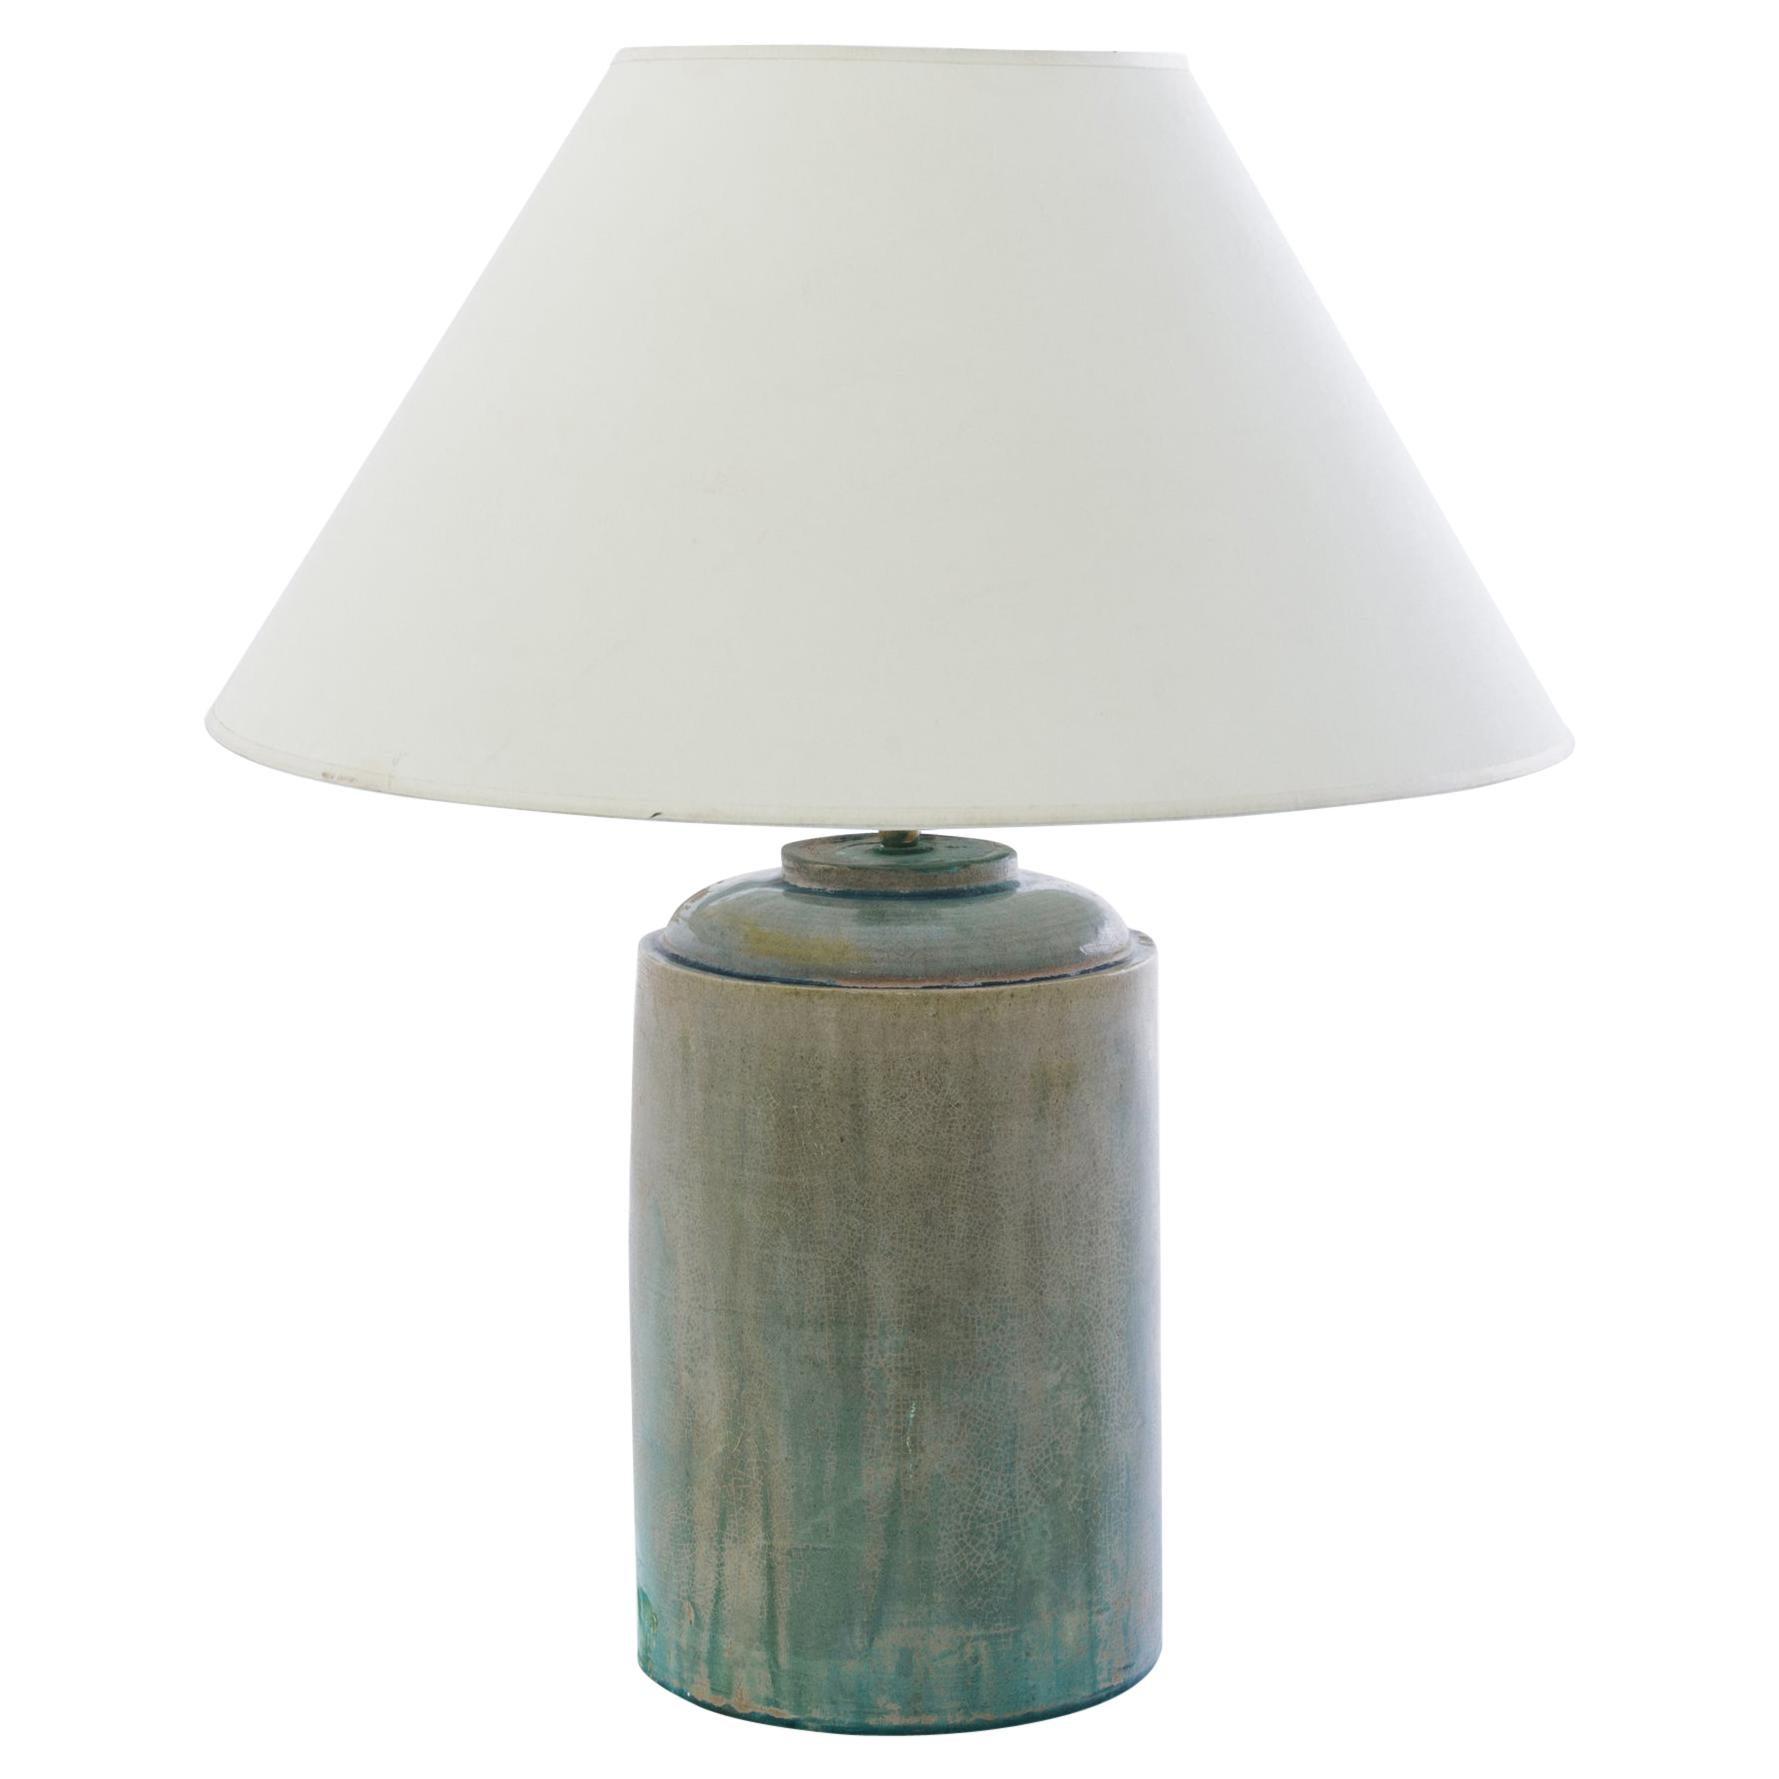 Antique Chinese Celadon Crackle Ceramic Vase Table Lamp